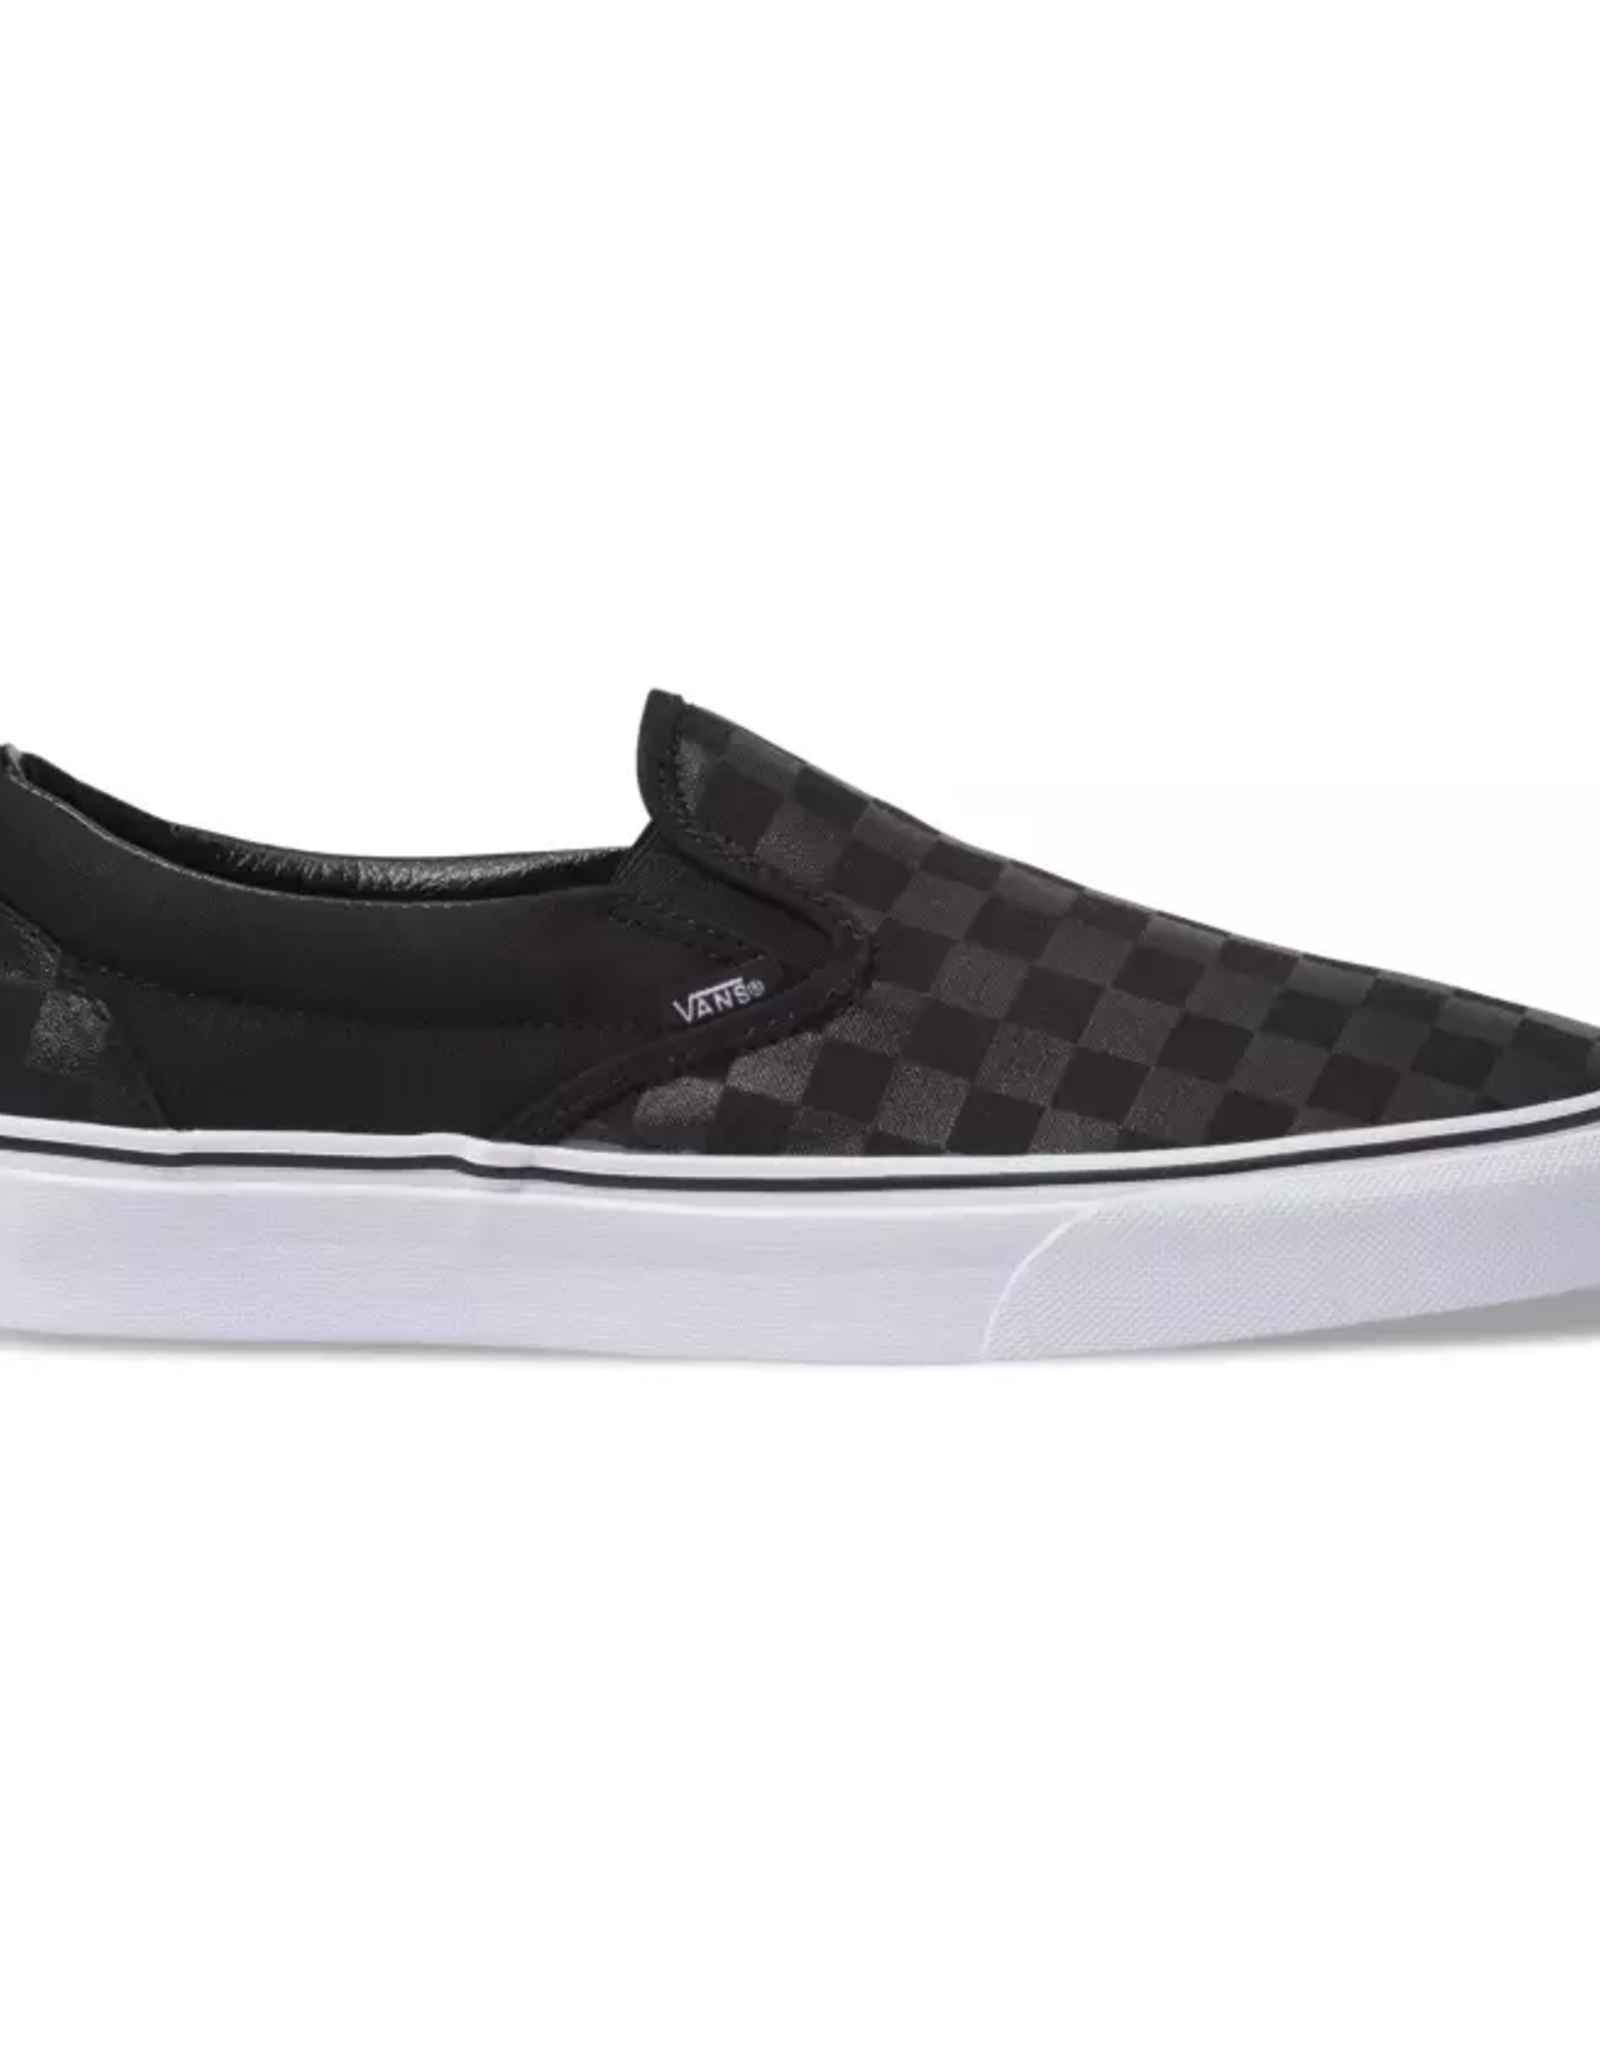 Vans UA Classic Slip On Checker 276 BlackBlack